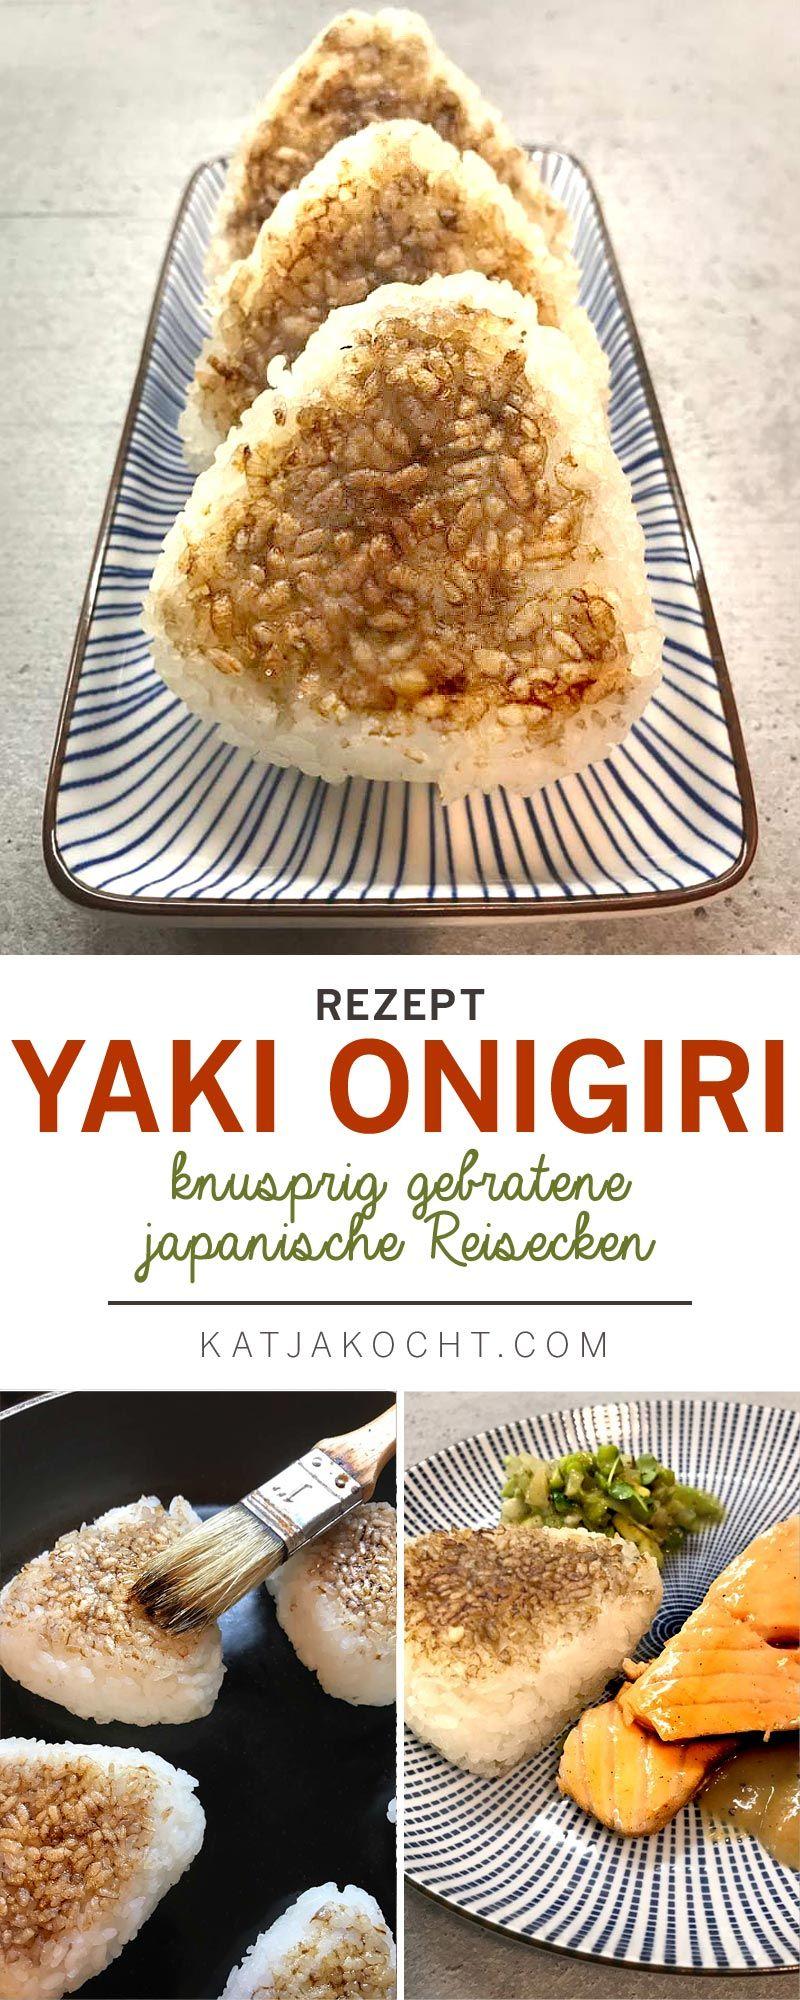 rezept yaki onigiri knusprige reisb llchen katja kocht foodblogger rezepte pinterest. Black Bedroom Furniture Sets. Home Design Ideas